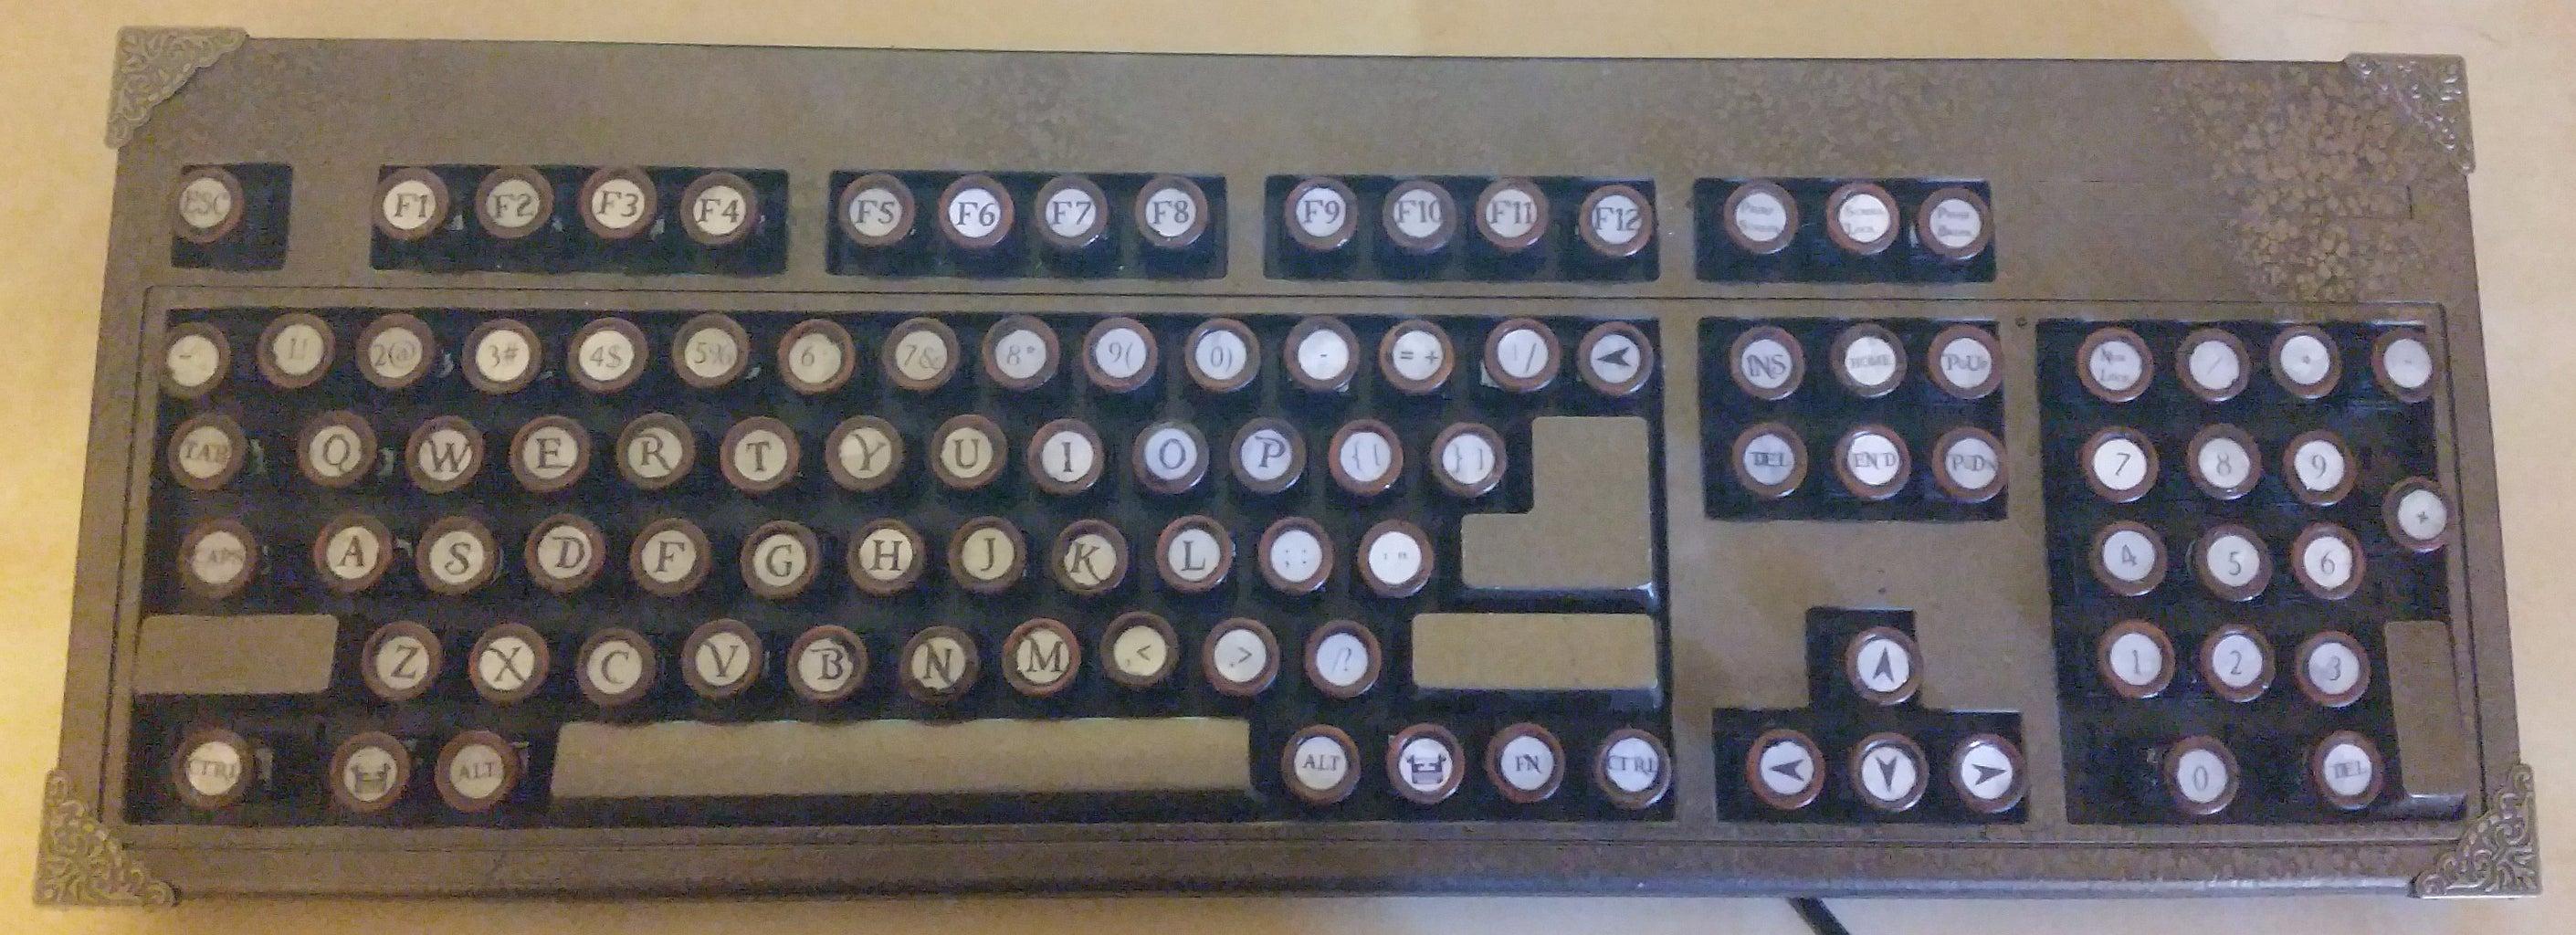 Homemade Steampunk Keyboard